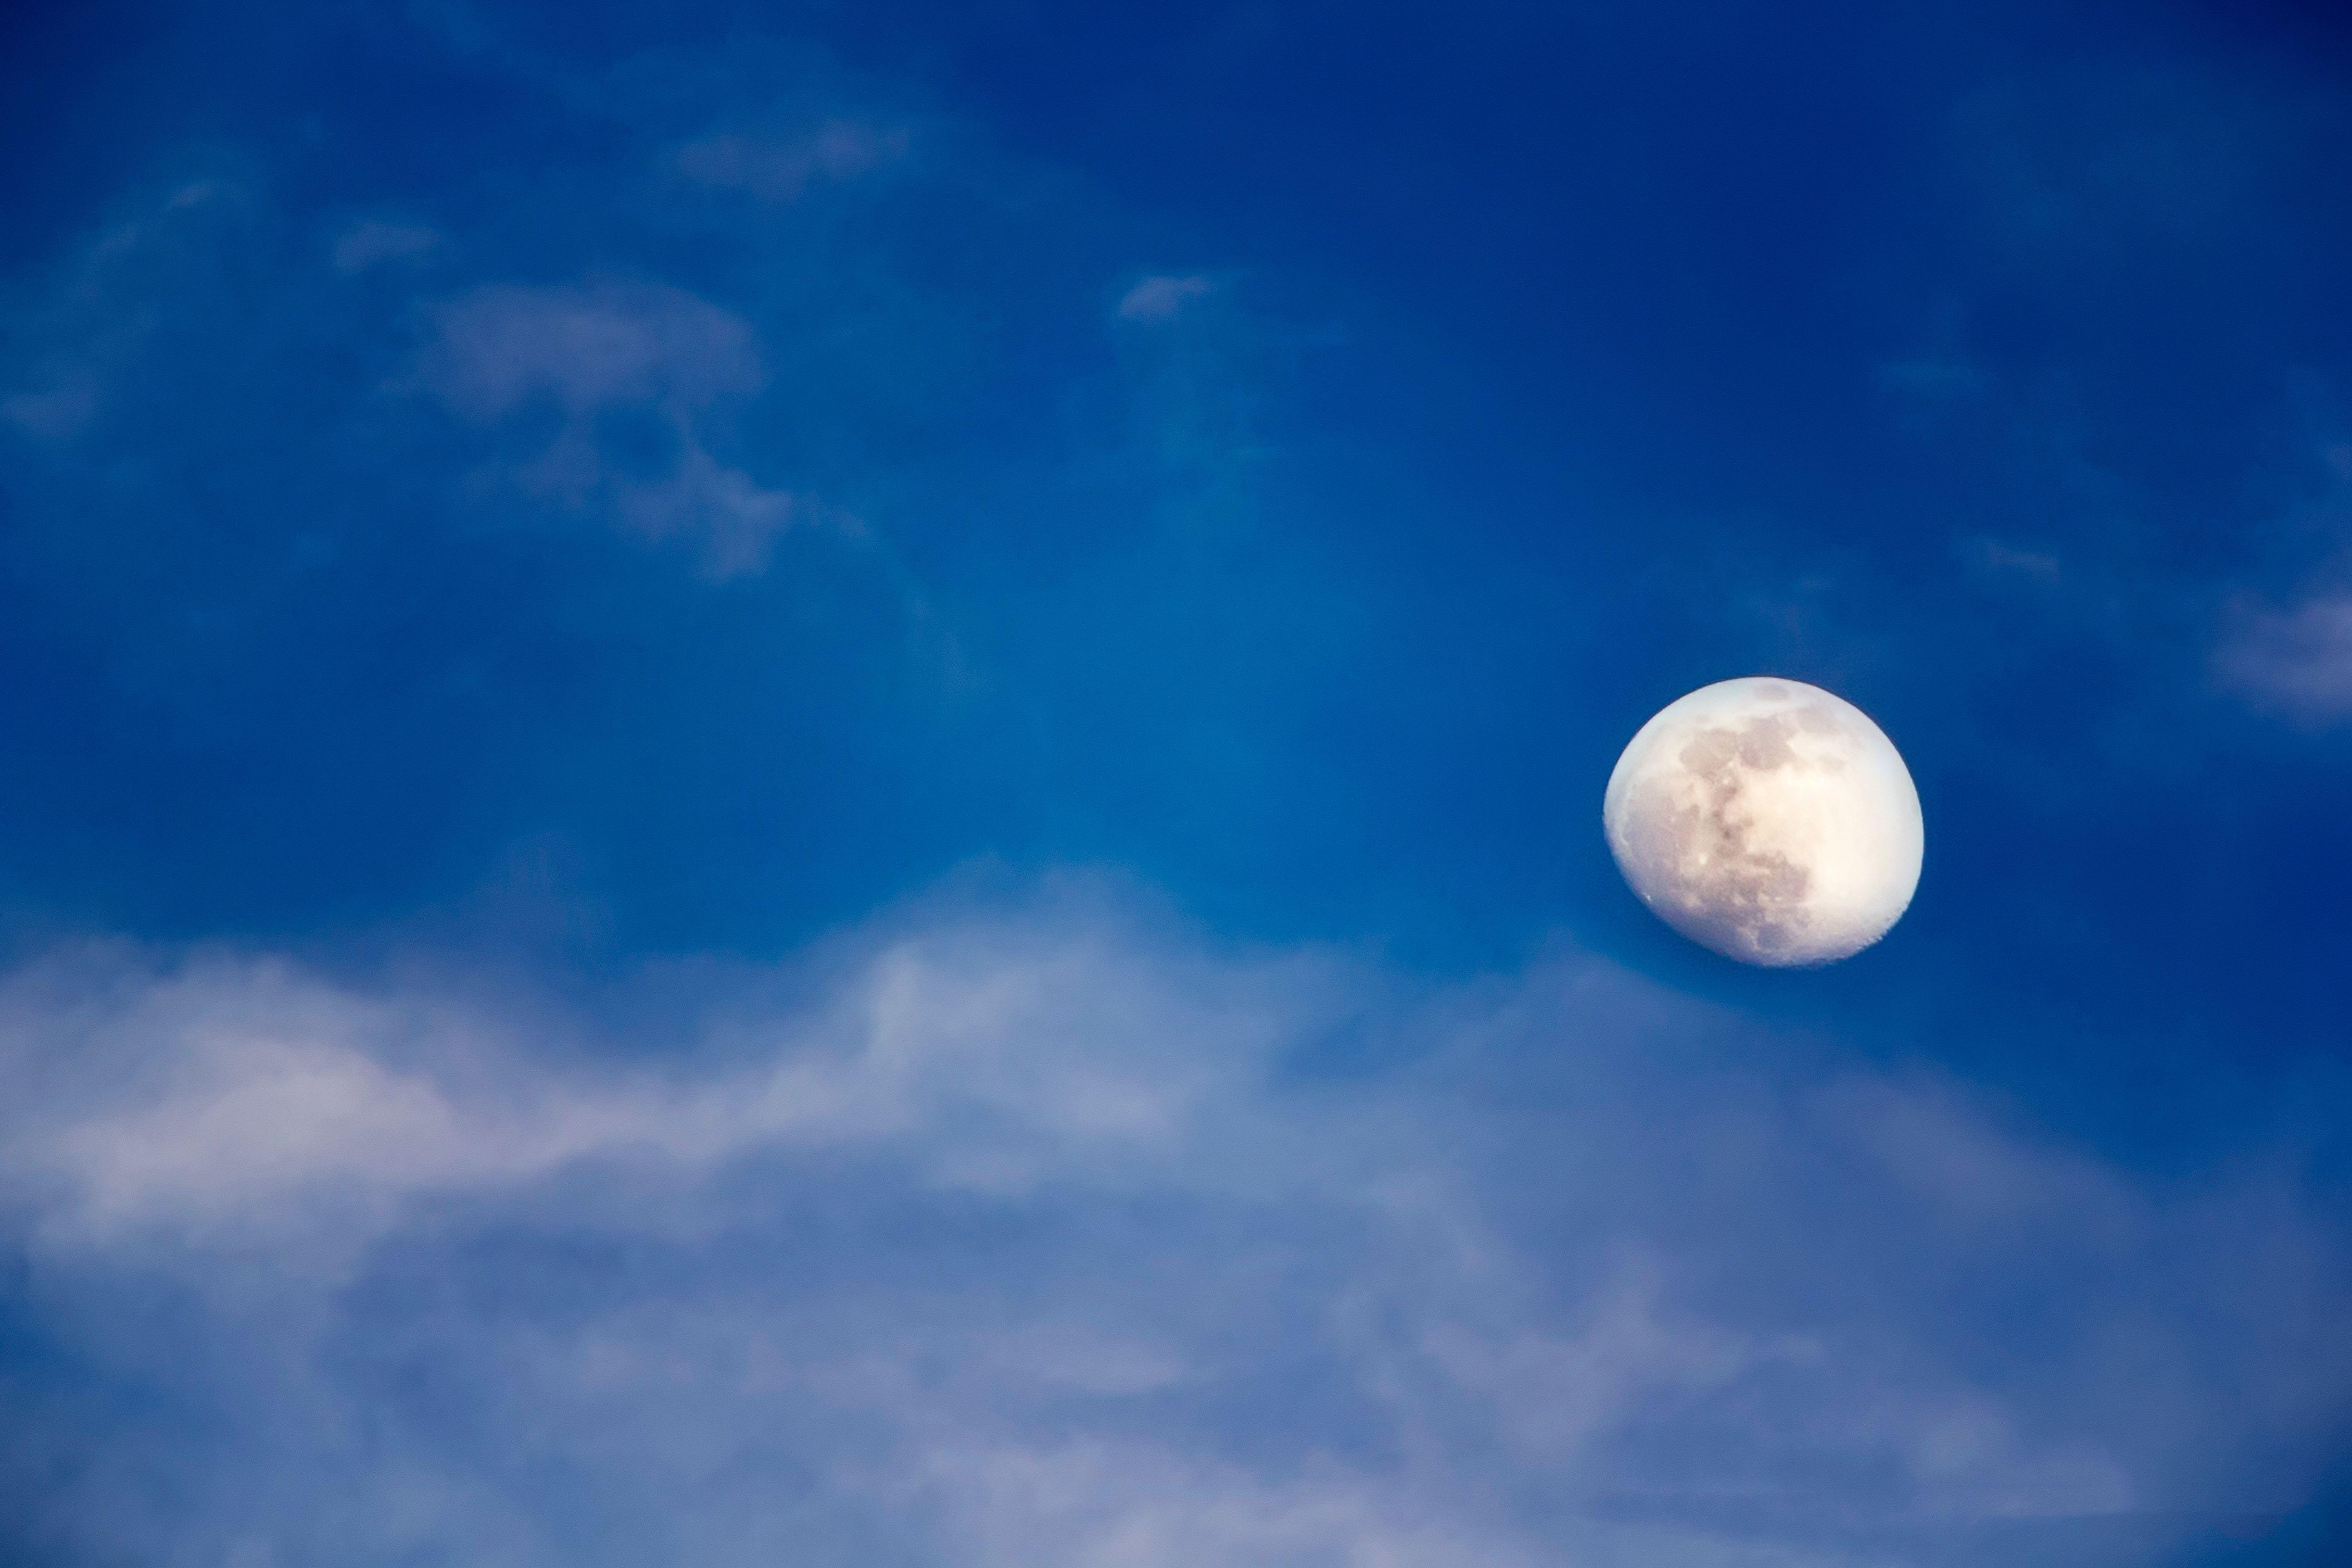 cryptos to the moon